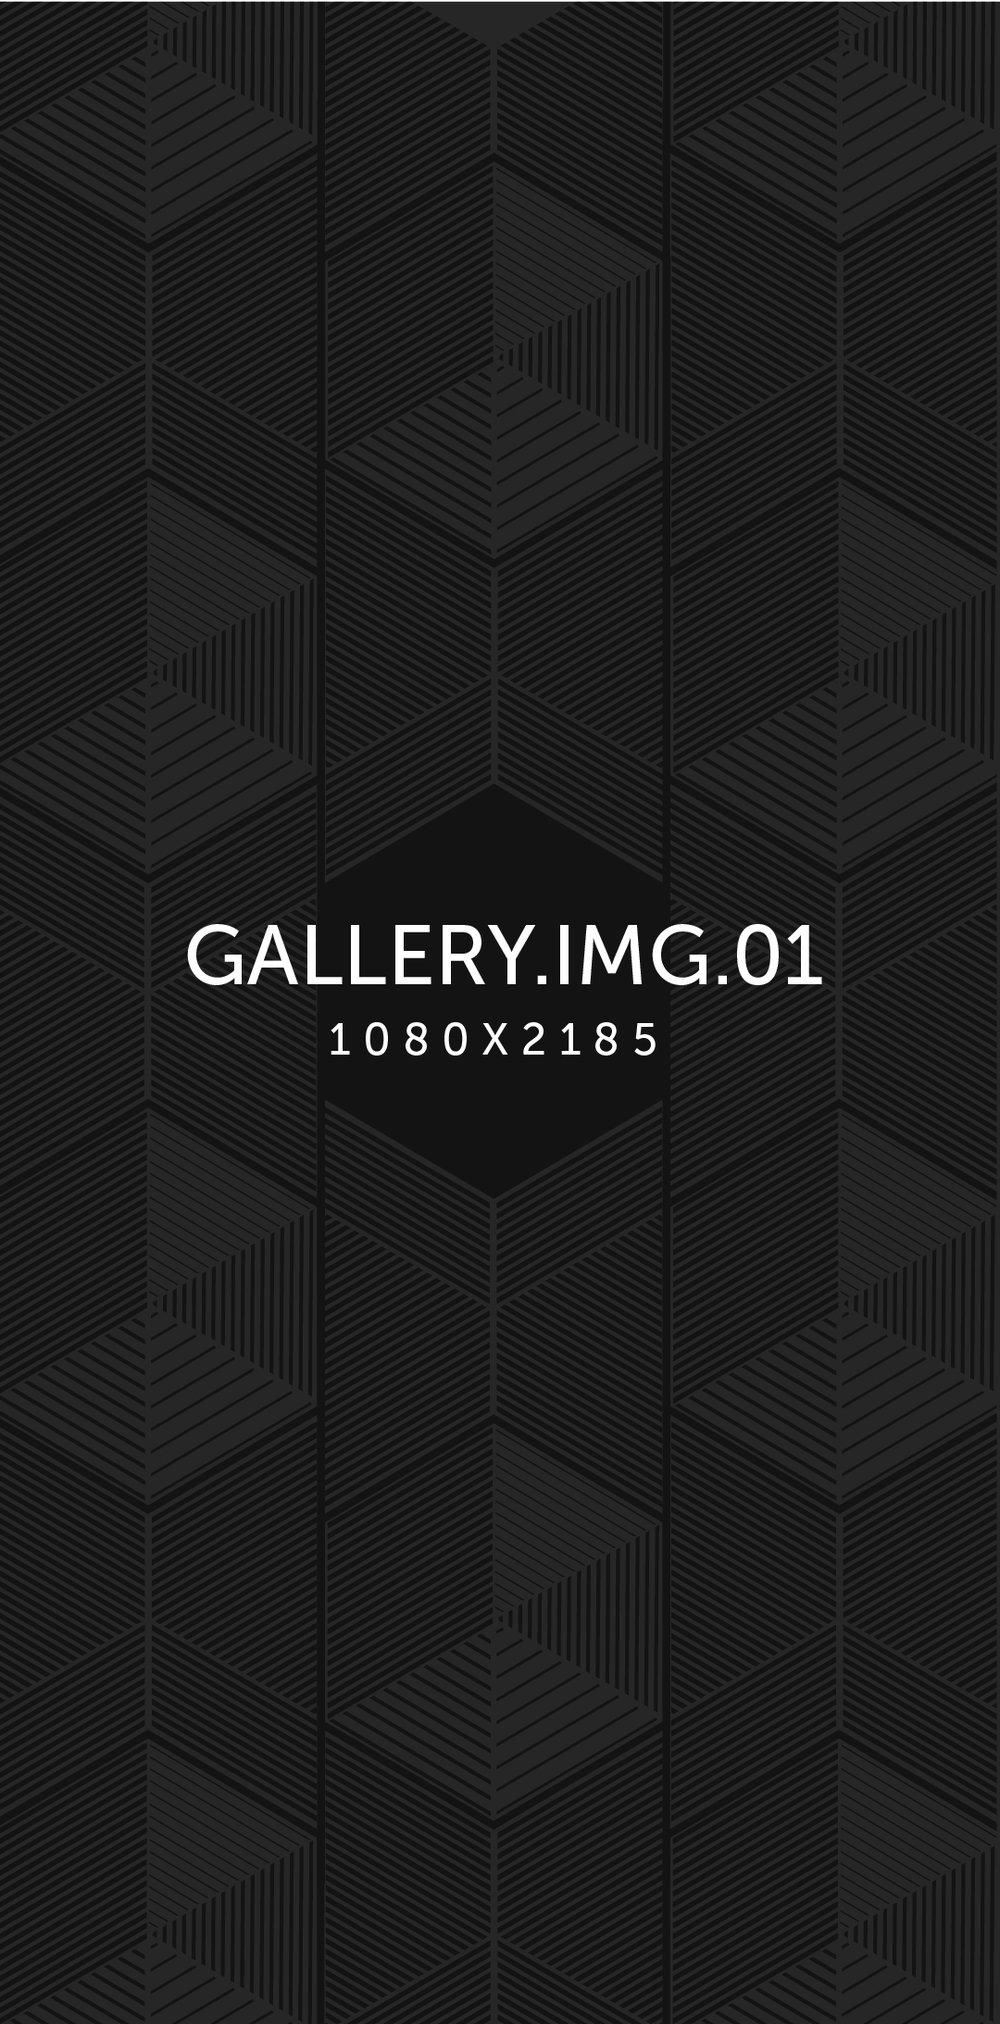 PB_GALLERY.iMG.01_1080x2185.jpg